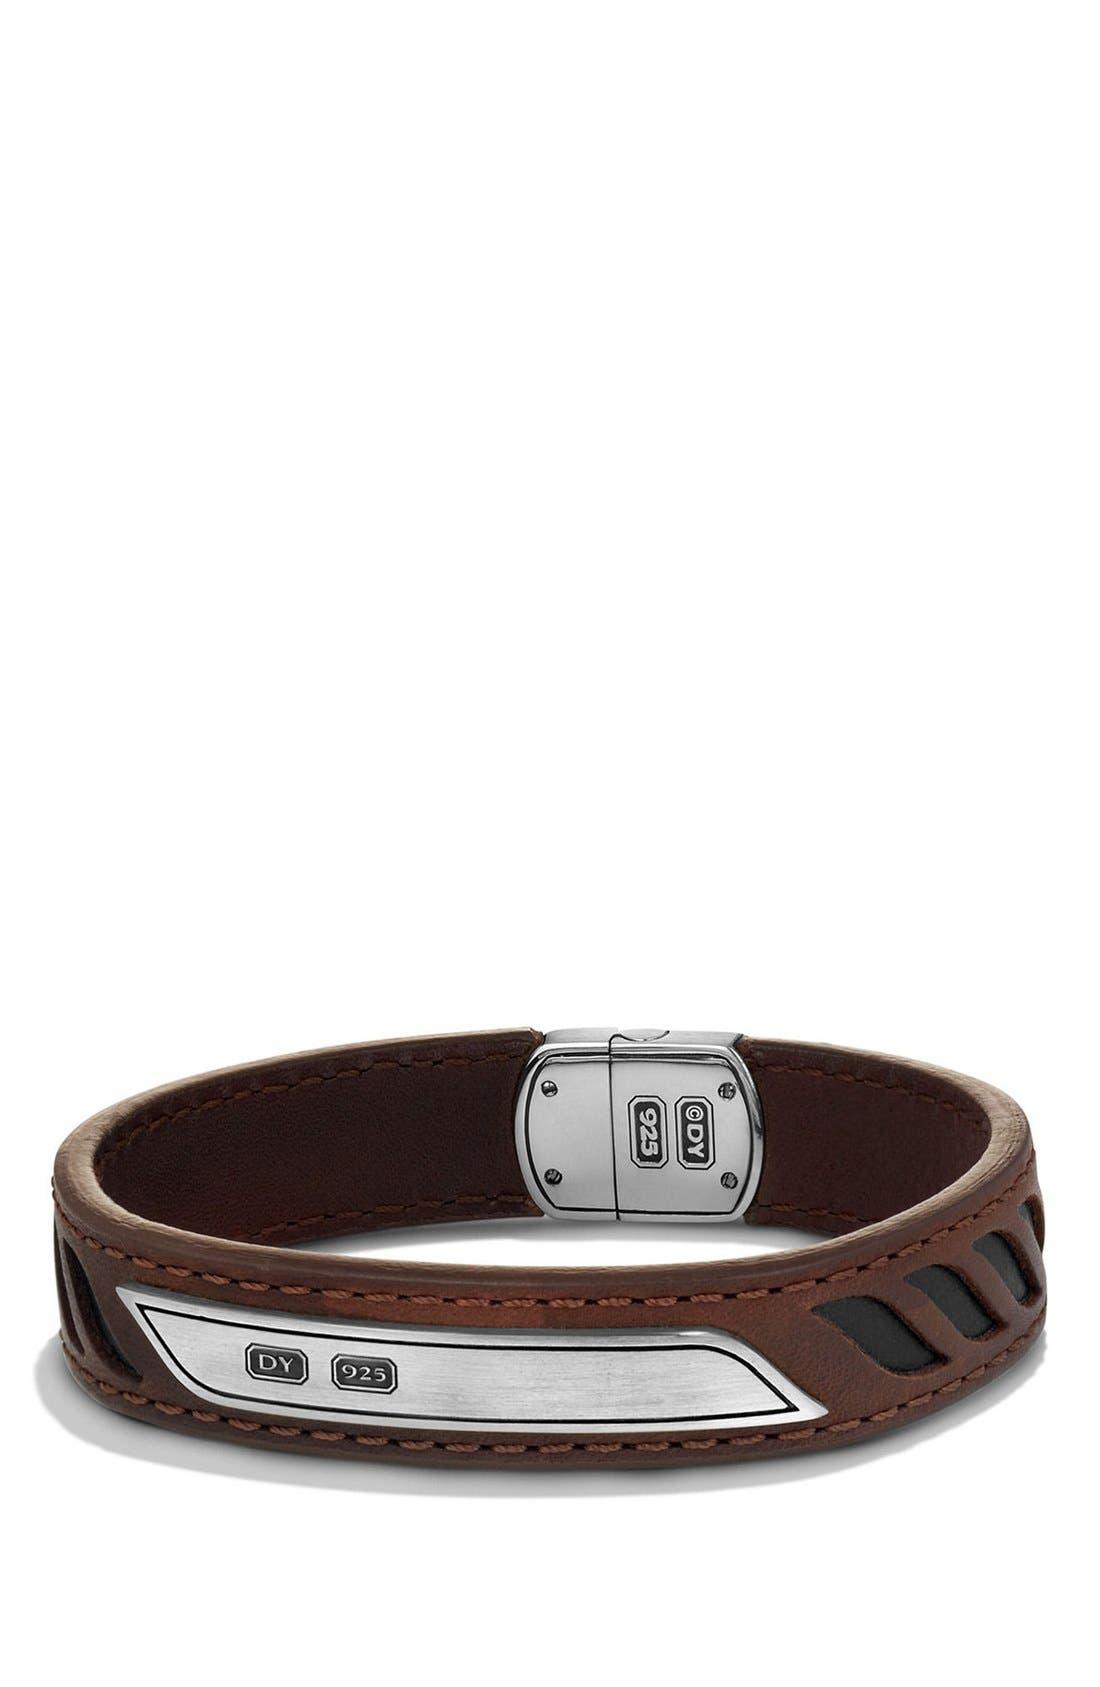 DAVID YURMAN Graphic Cable Leather ID Bracelet